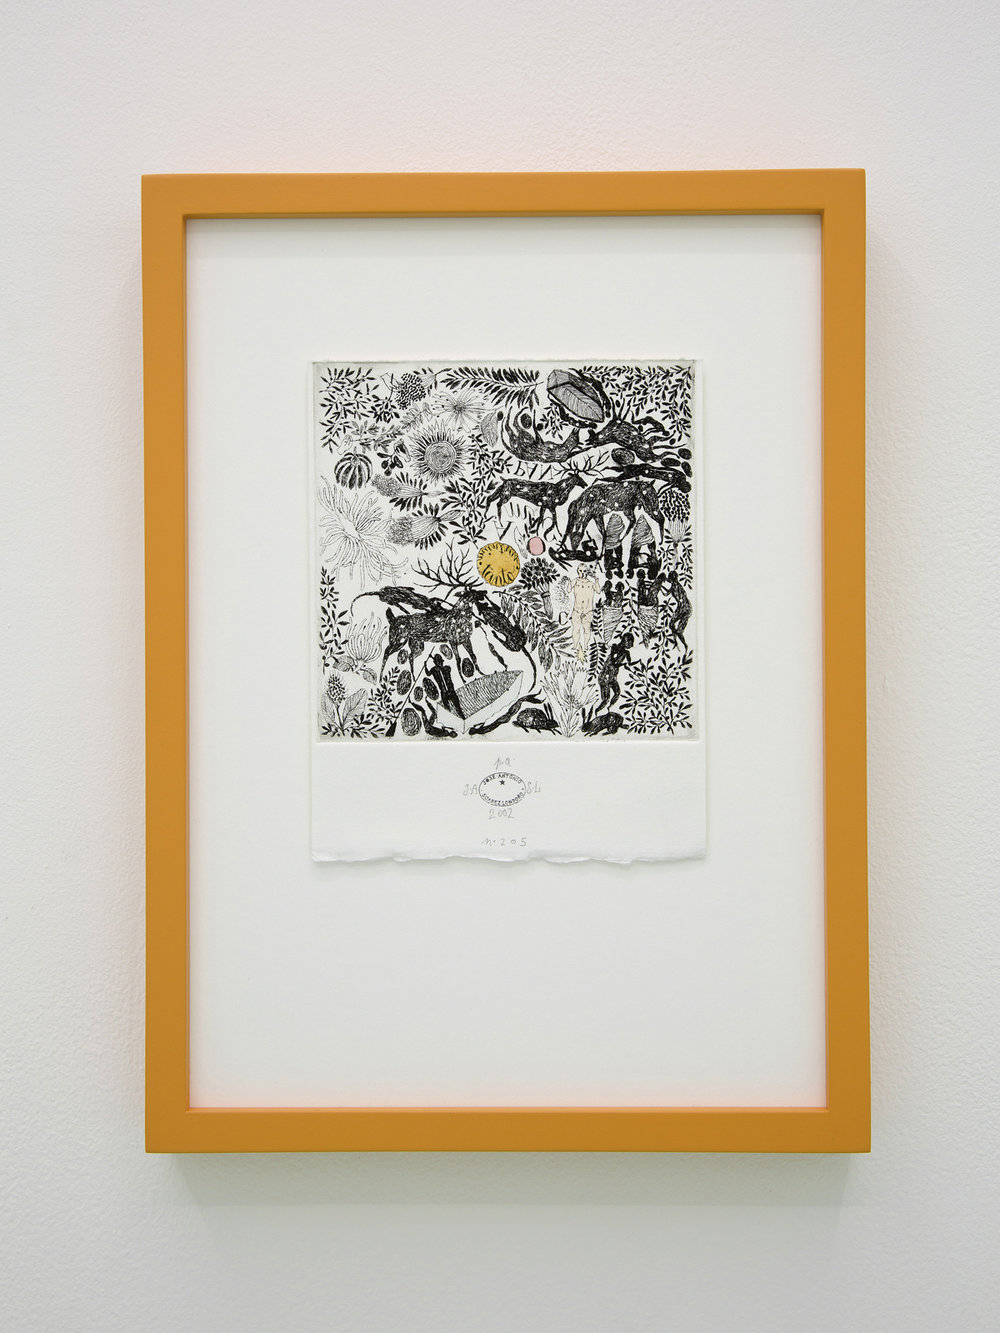 José Antonio Suárez Londoño, Untitled #205, 2002.